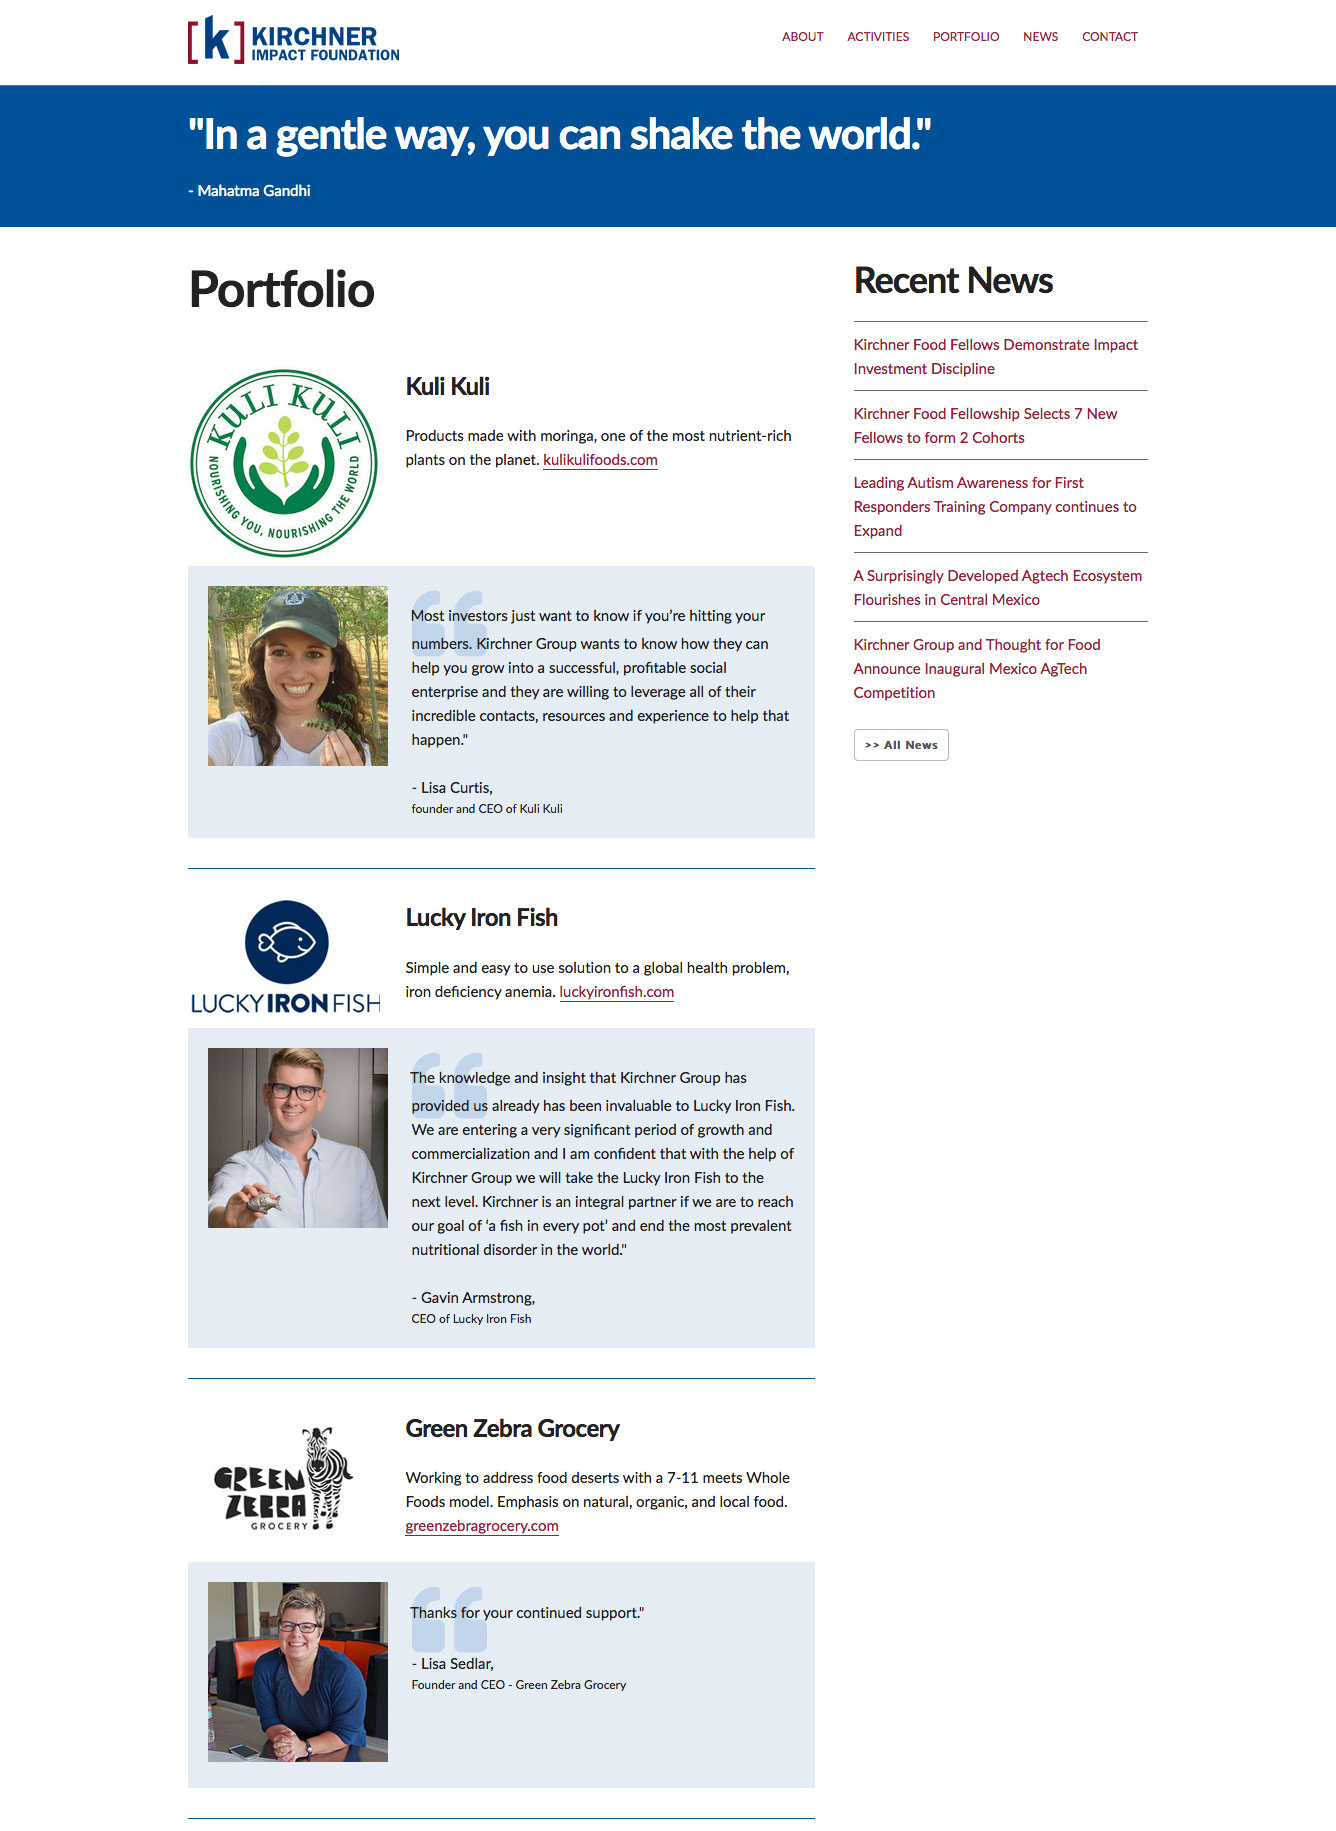 Kirchner Impact Foundation Portfolio Page